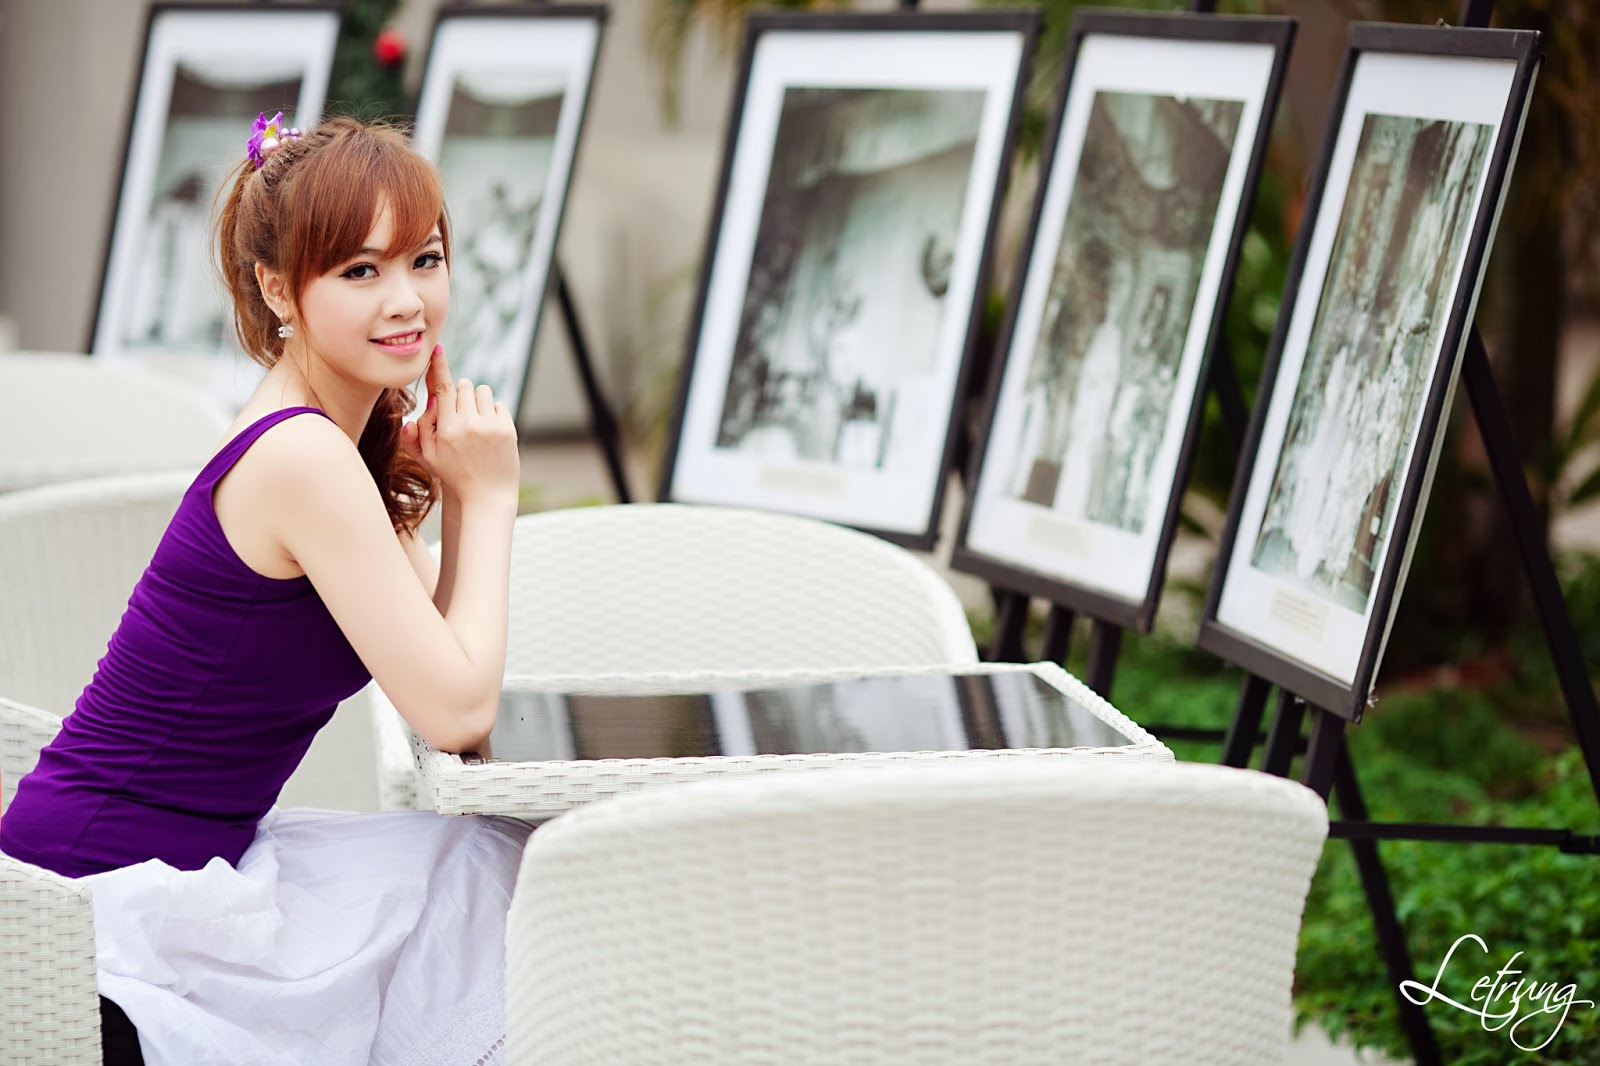 Beautiful Vietnamese Girls Wallpapers